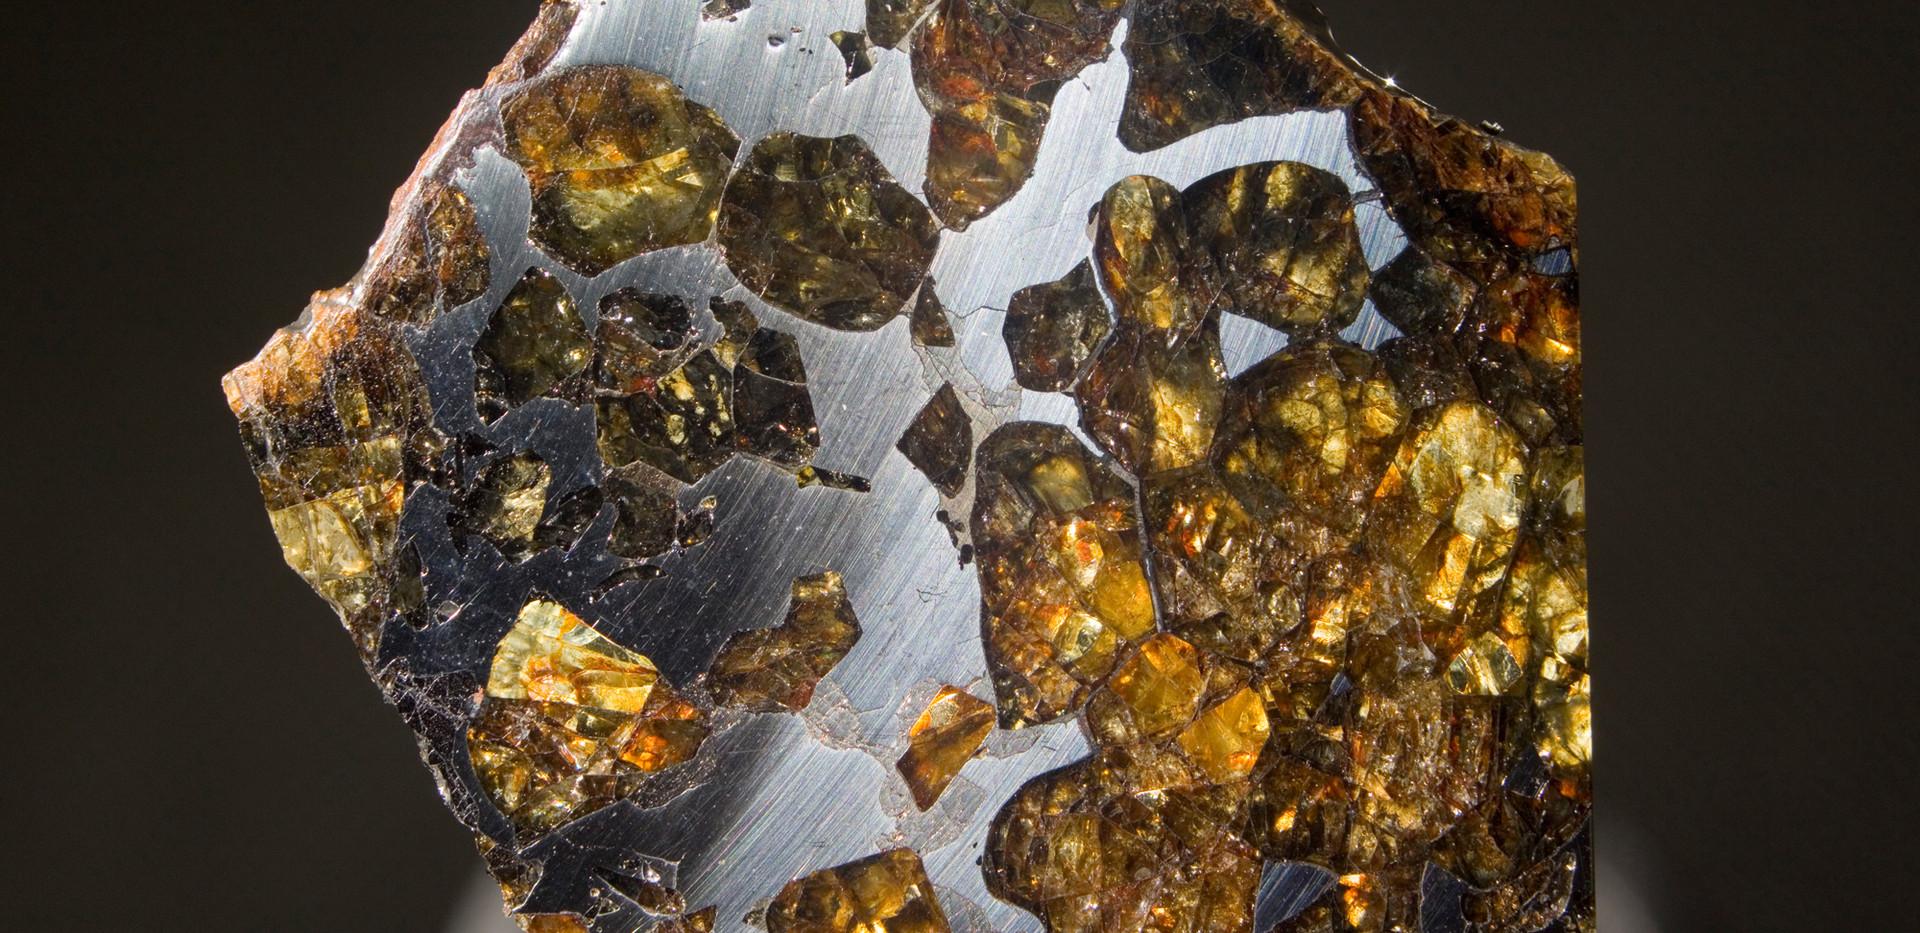 Pallasite Meteorite Imilac, Back. 4 cm x 4 cm 13 grams SMIM05